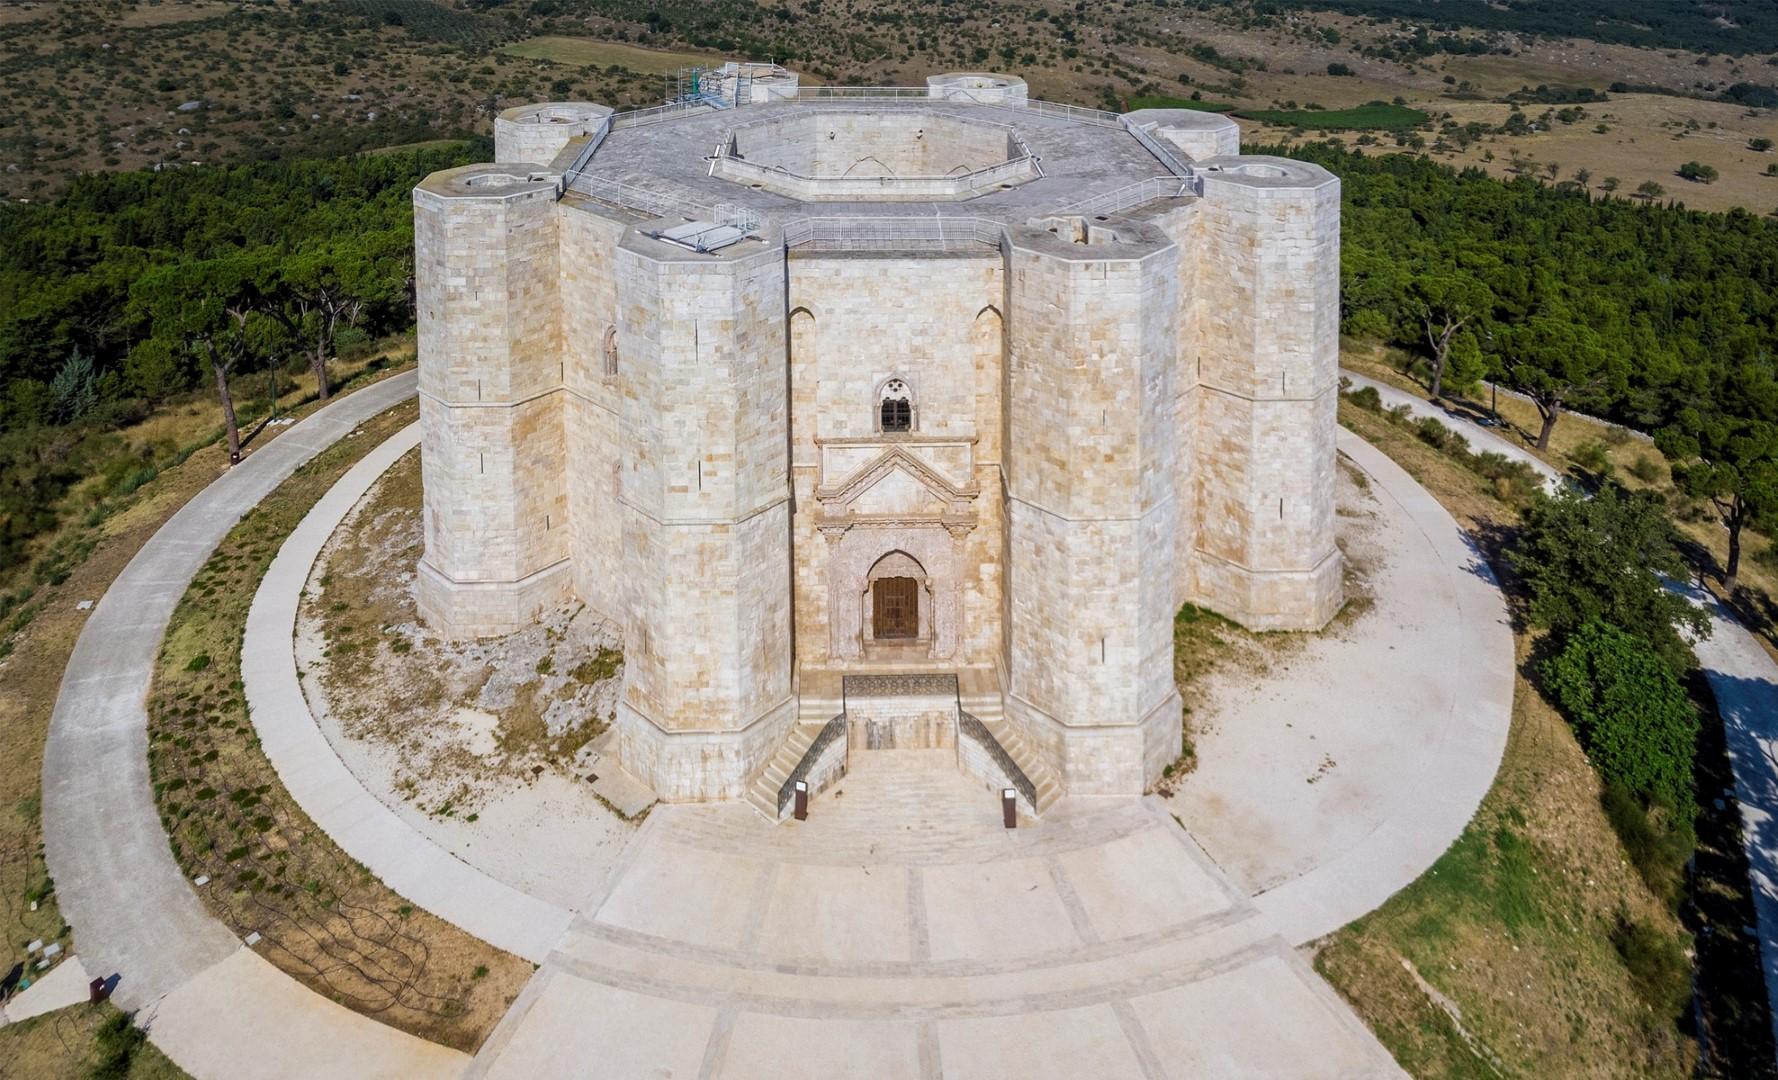 Dieci splendidi castelli in tutta Italia